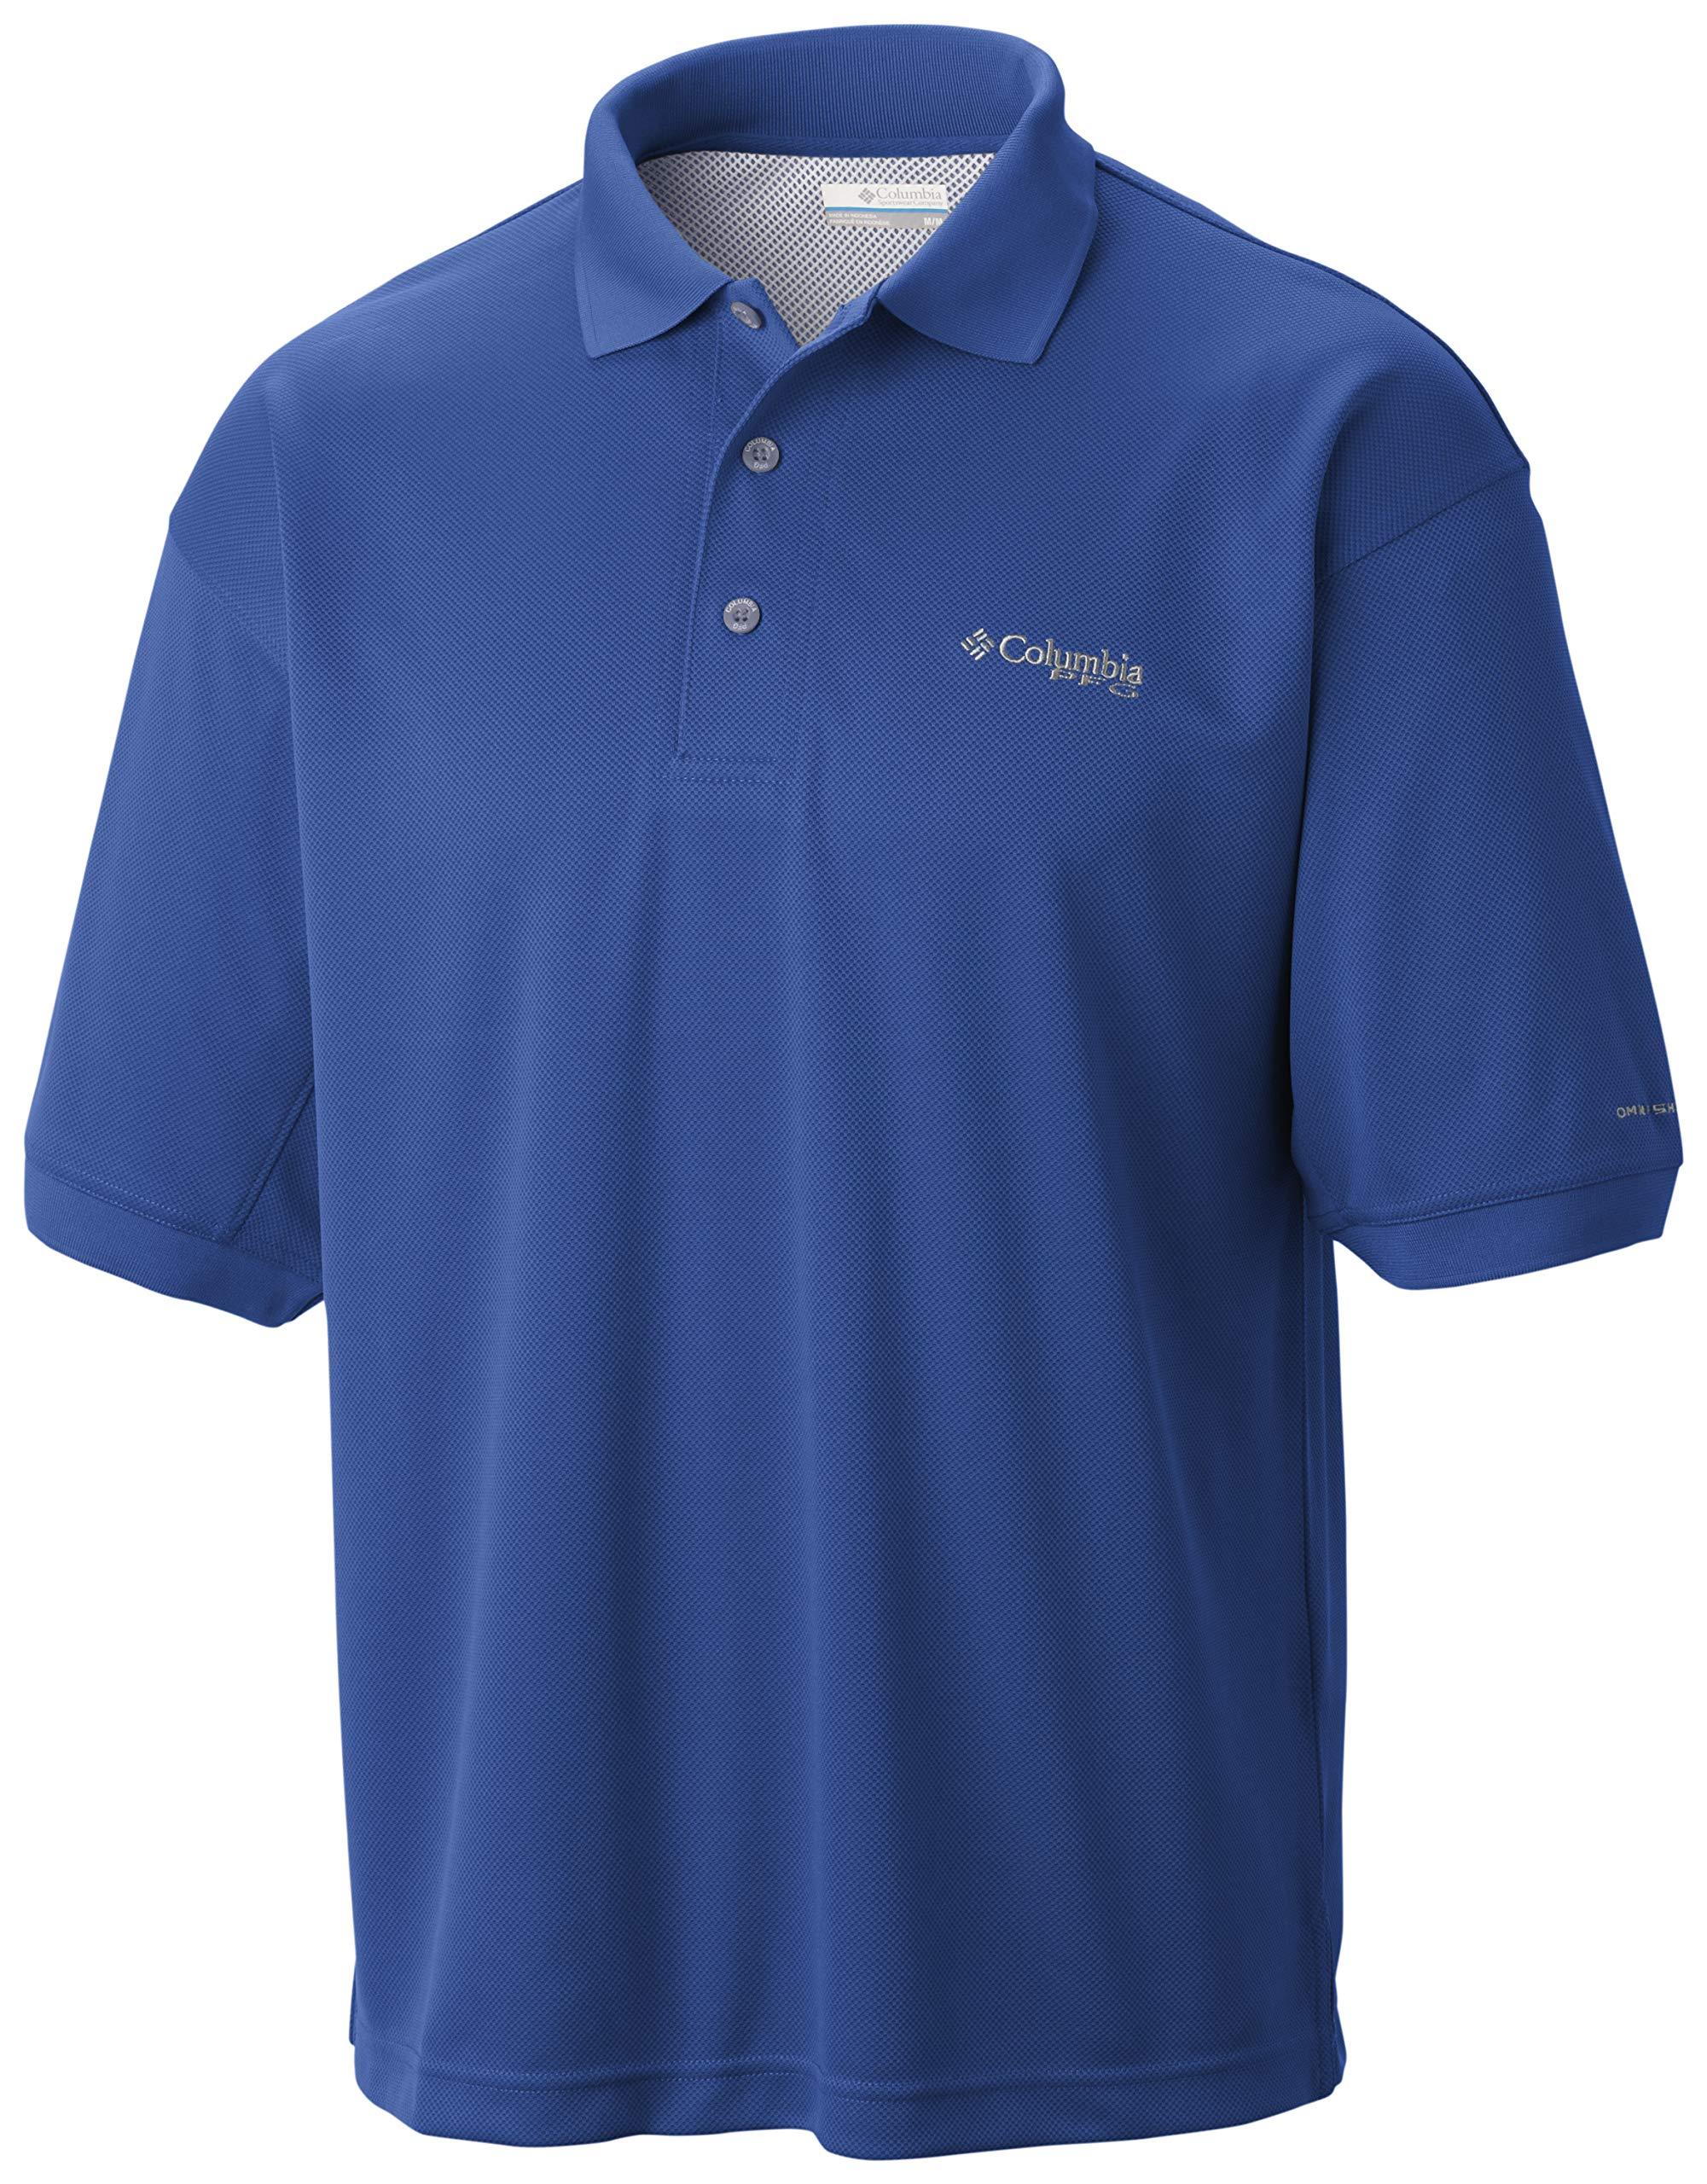 Columbia Sportswear Men's Perfect Cast Polo Shirt, Vivid Blue, 4X Tall